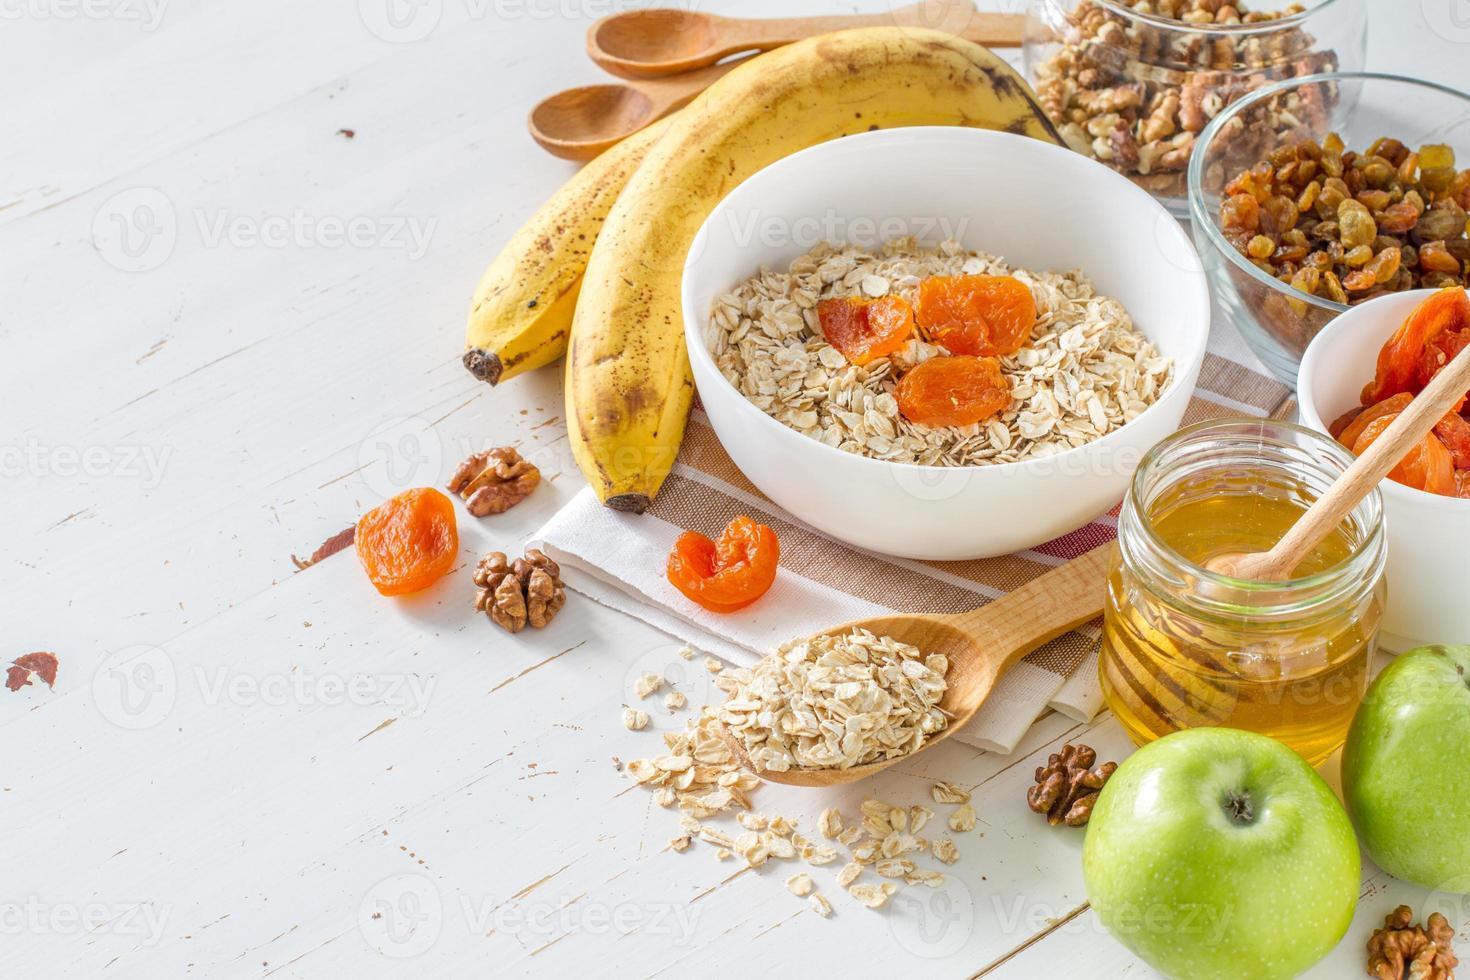 muesli-ingrediënten - haver, banaan, honing, noten, appel, gedroogde abrikoos foto